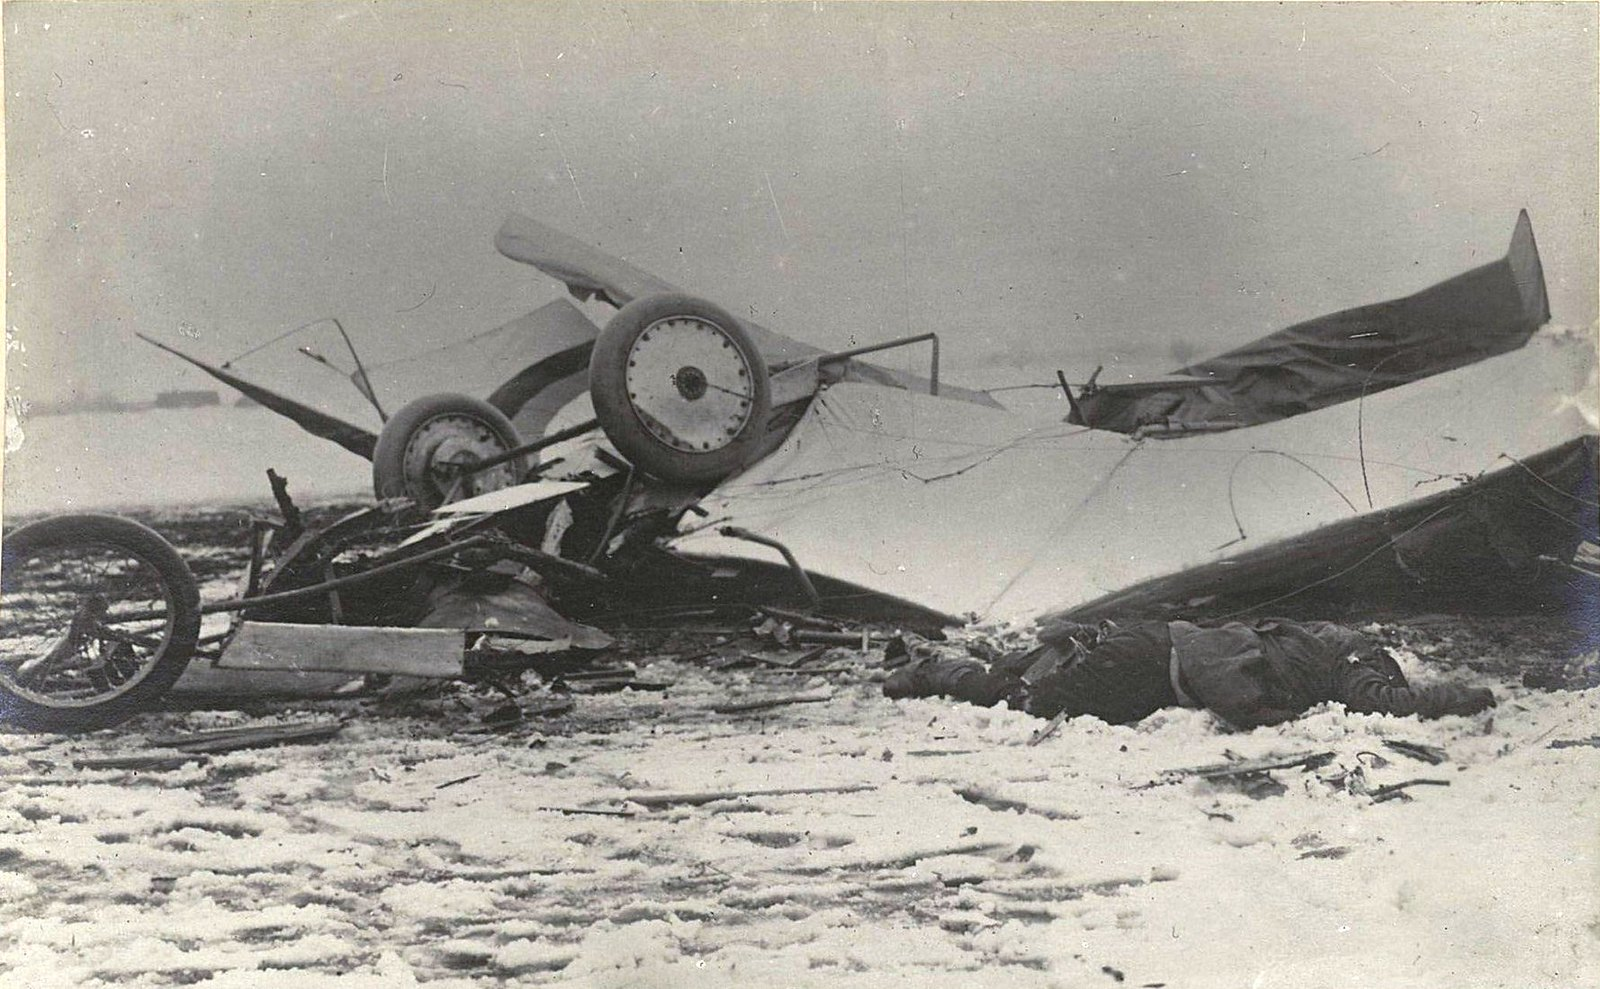 Разбившийся аэроплан и труп лётчика